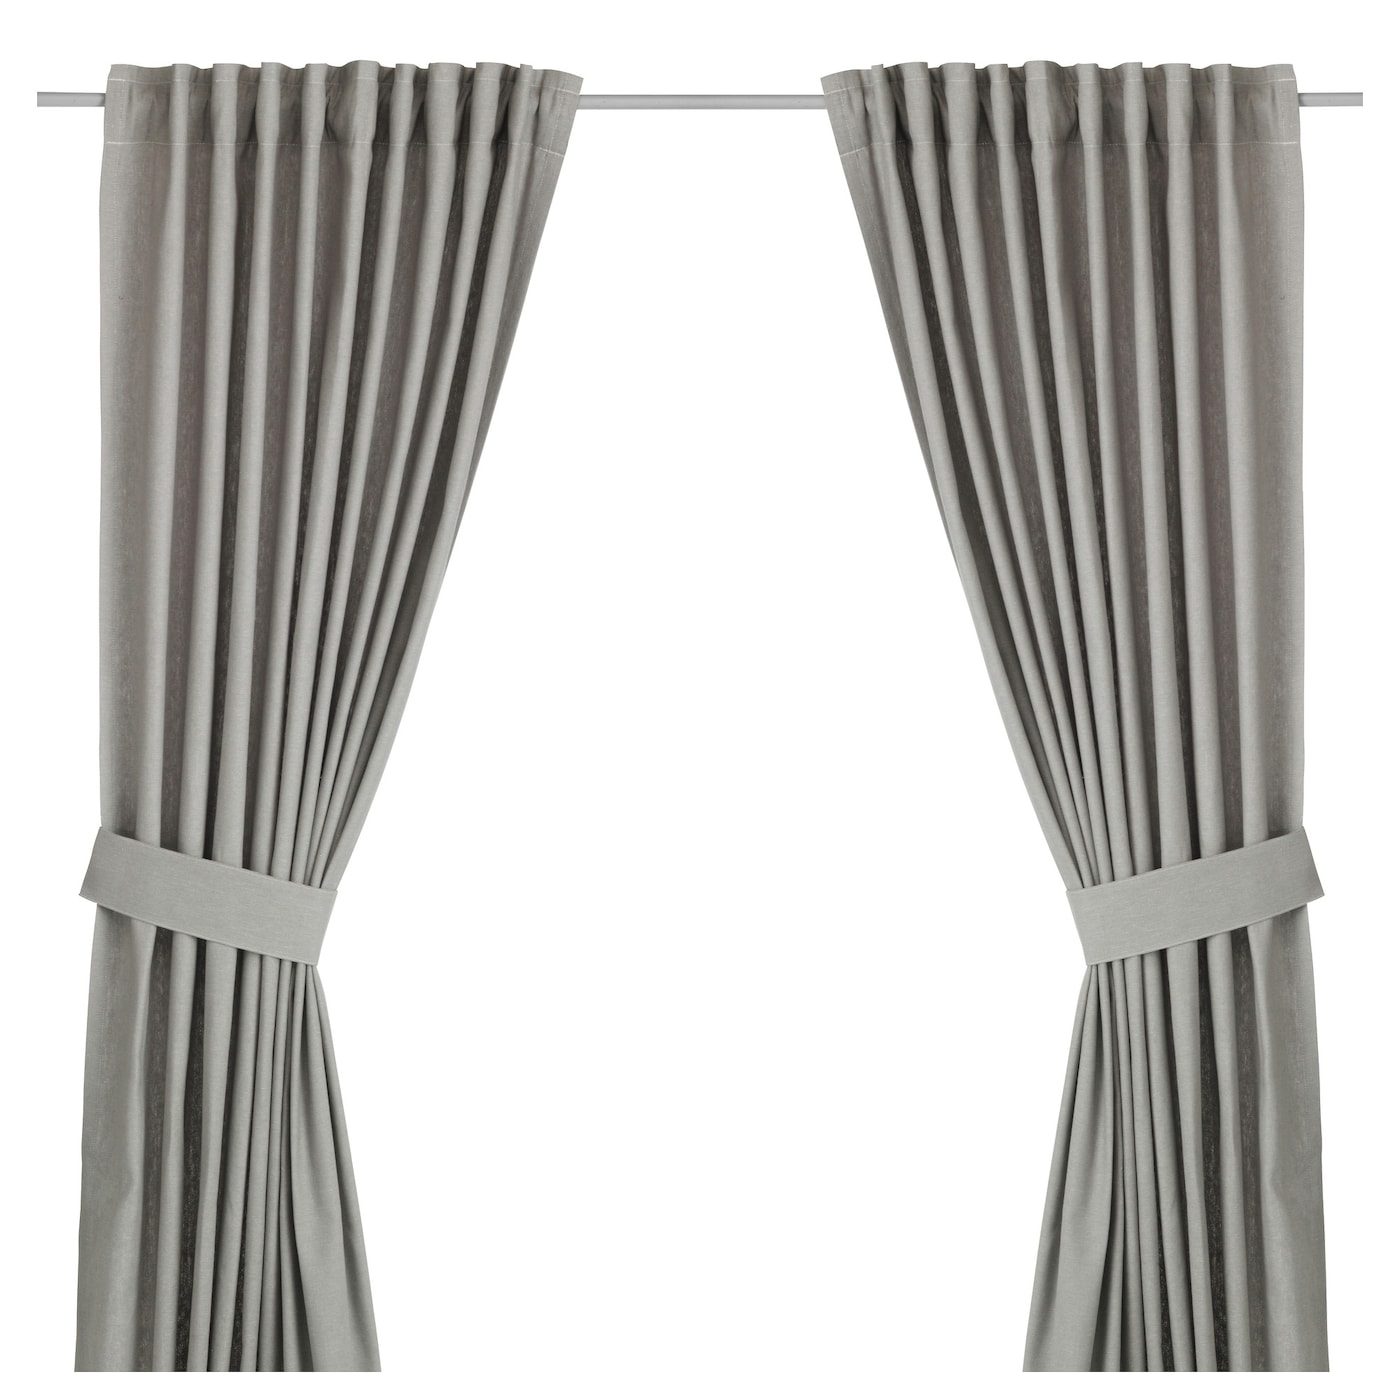 gordijn ikea. Black Bedroom Furniture Sets. Home Design Ideas